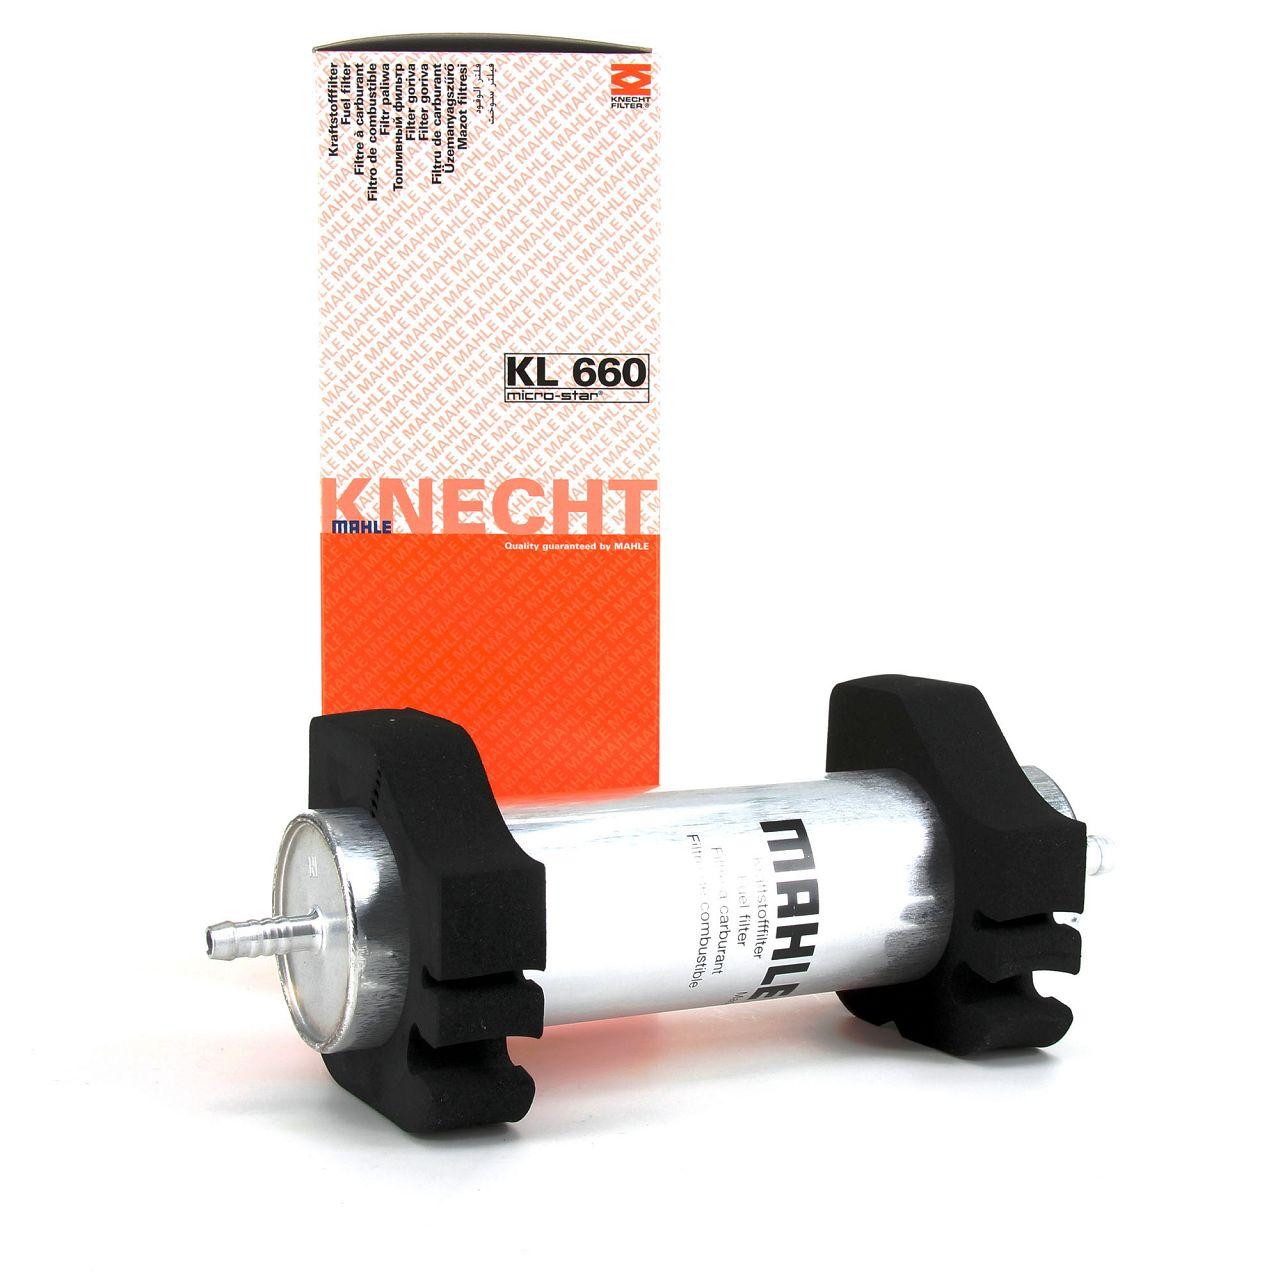 KNECHT / MAHLE Kraftstofffilter Dieselfilter AUDI Q5 8RB 2.0/3.0 TDI 8T0127401A